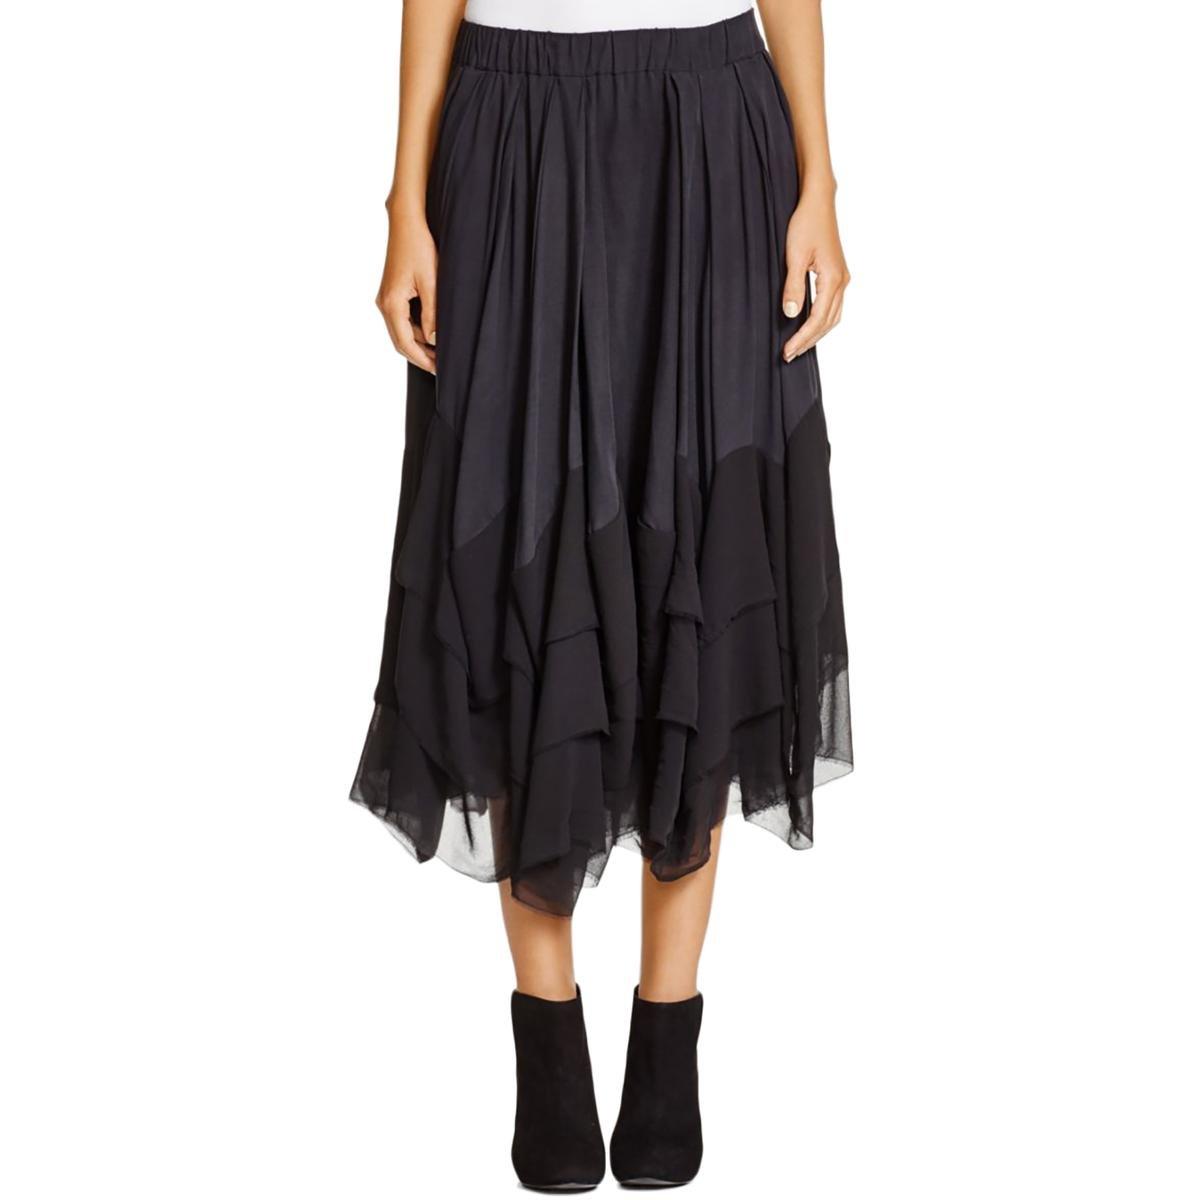 Pure DKNY Womens Petites Silk Blend Pleated Tiered Skirt Black M